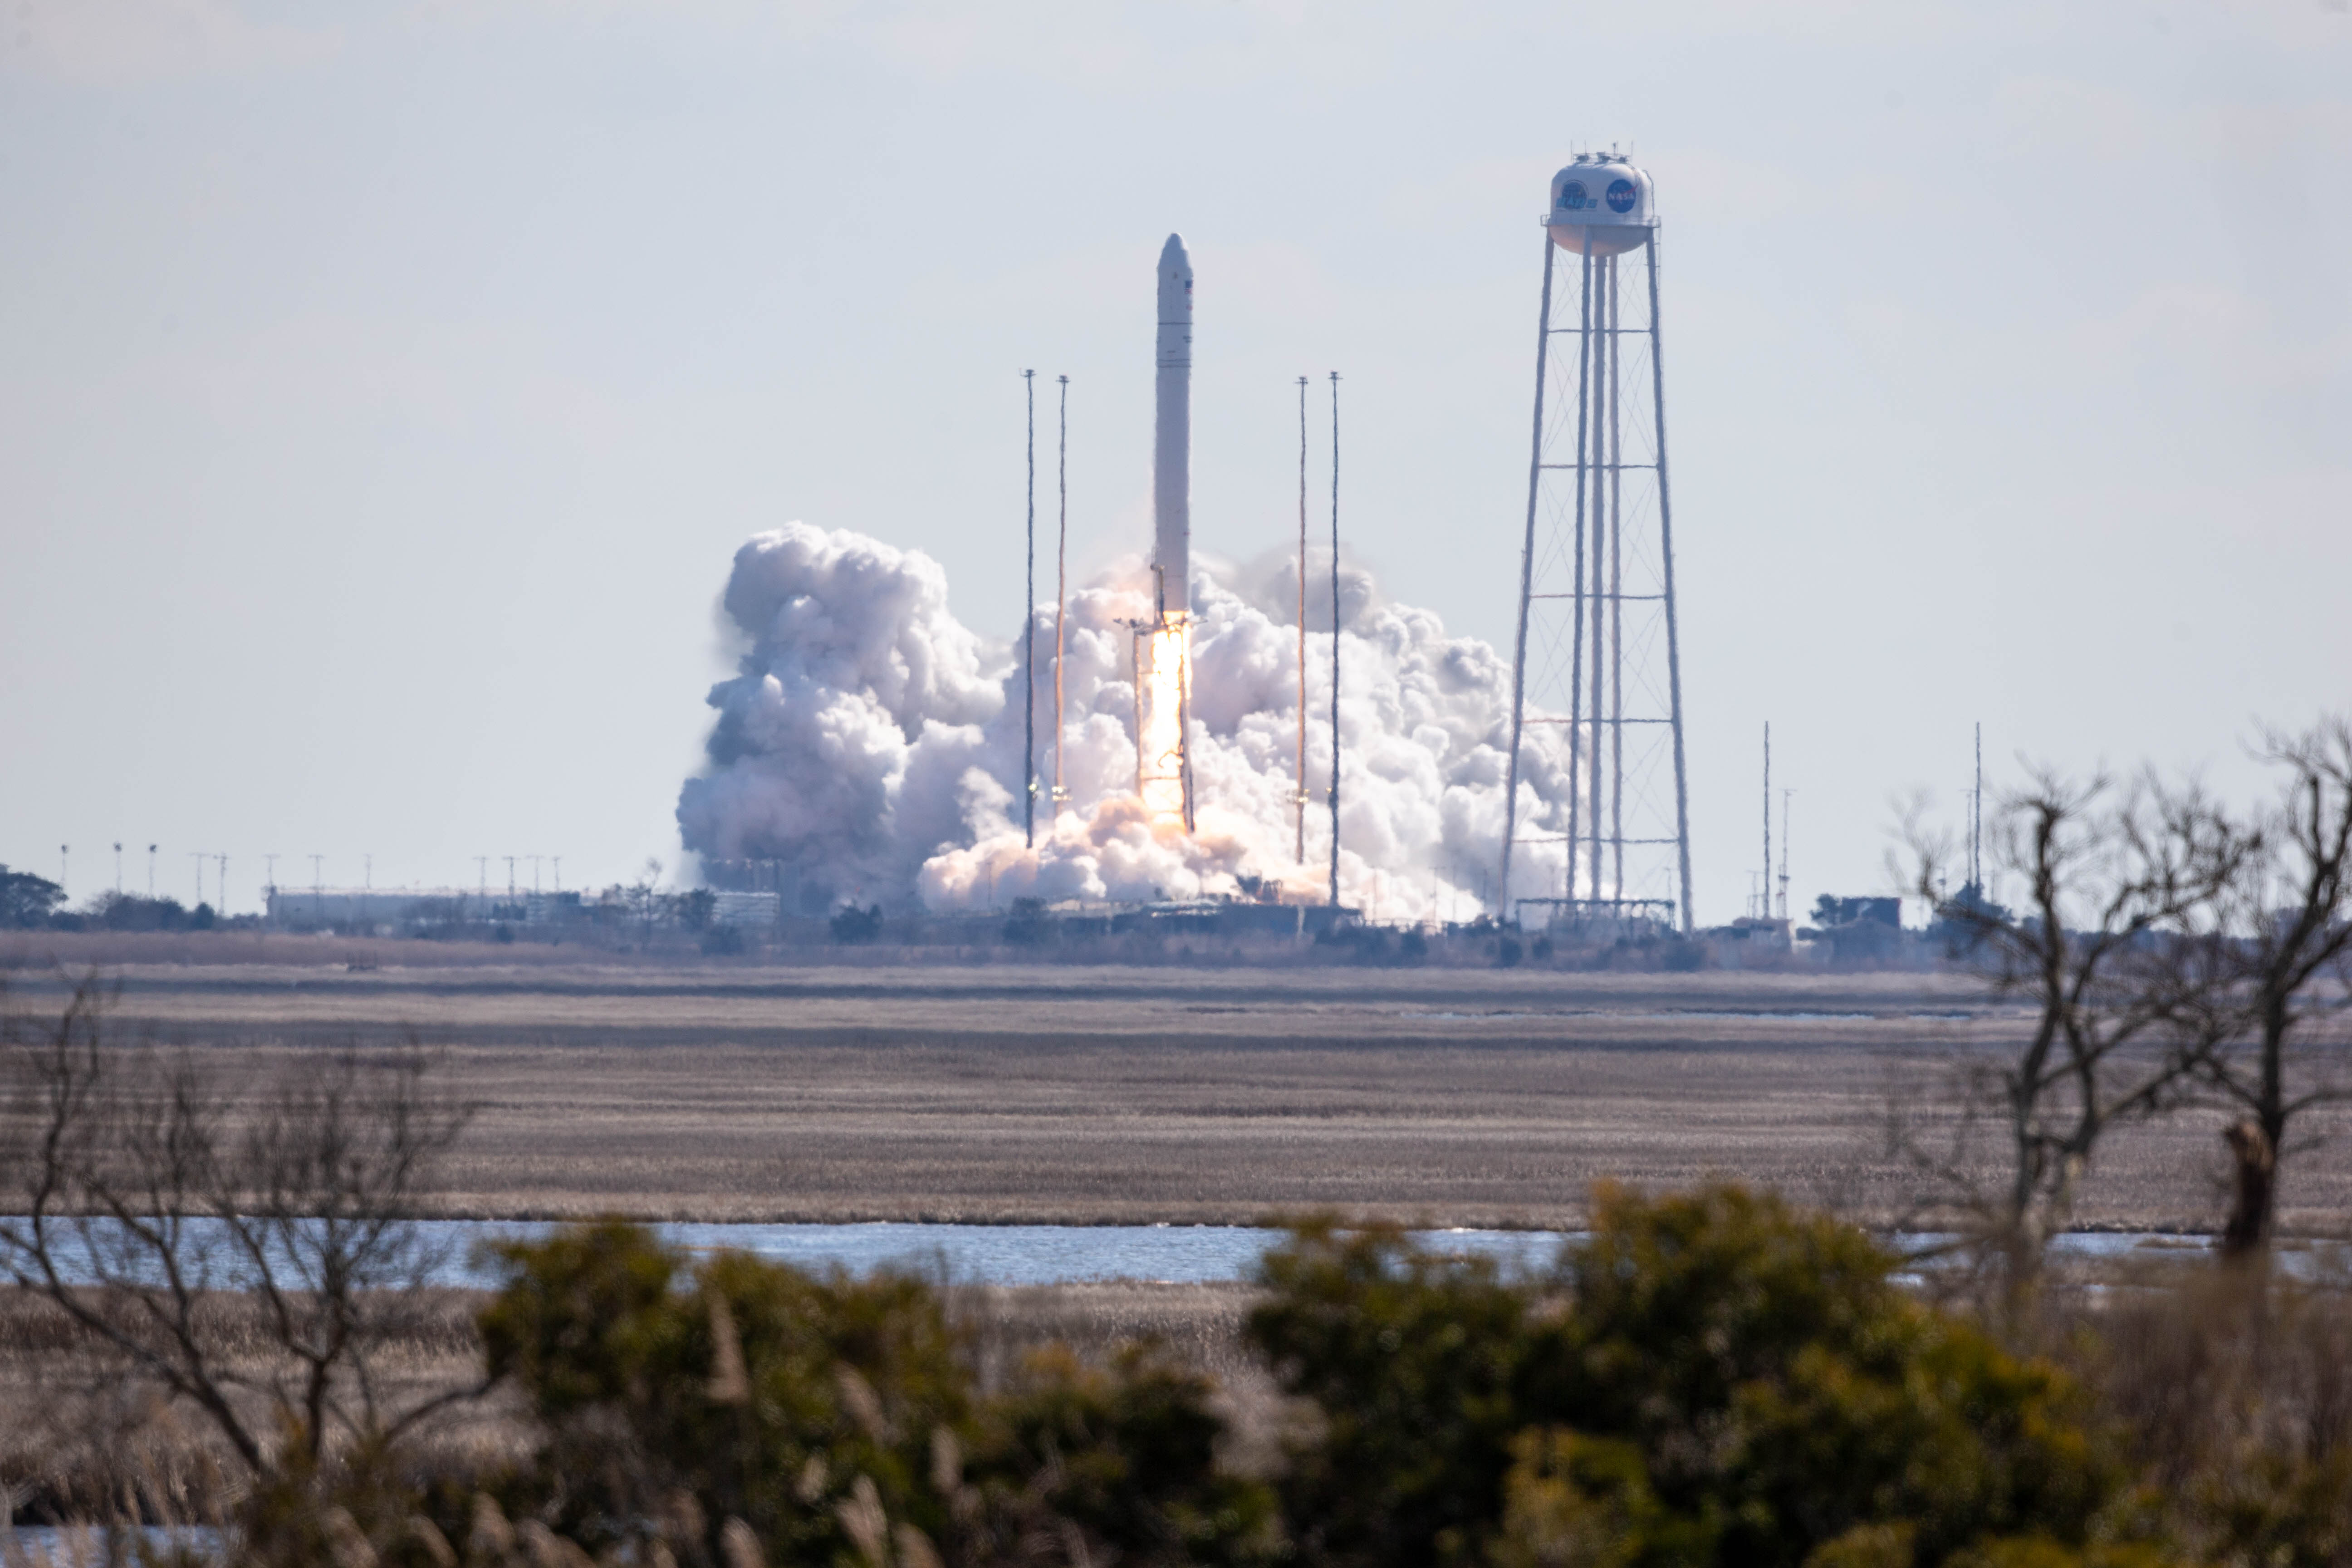 NASA Science, Cargo Launches on 15th Northrop Grumman Resupply Mission - NASA